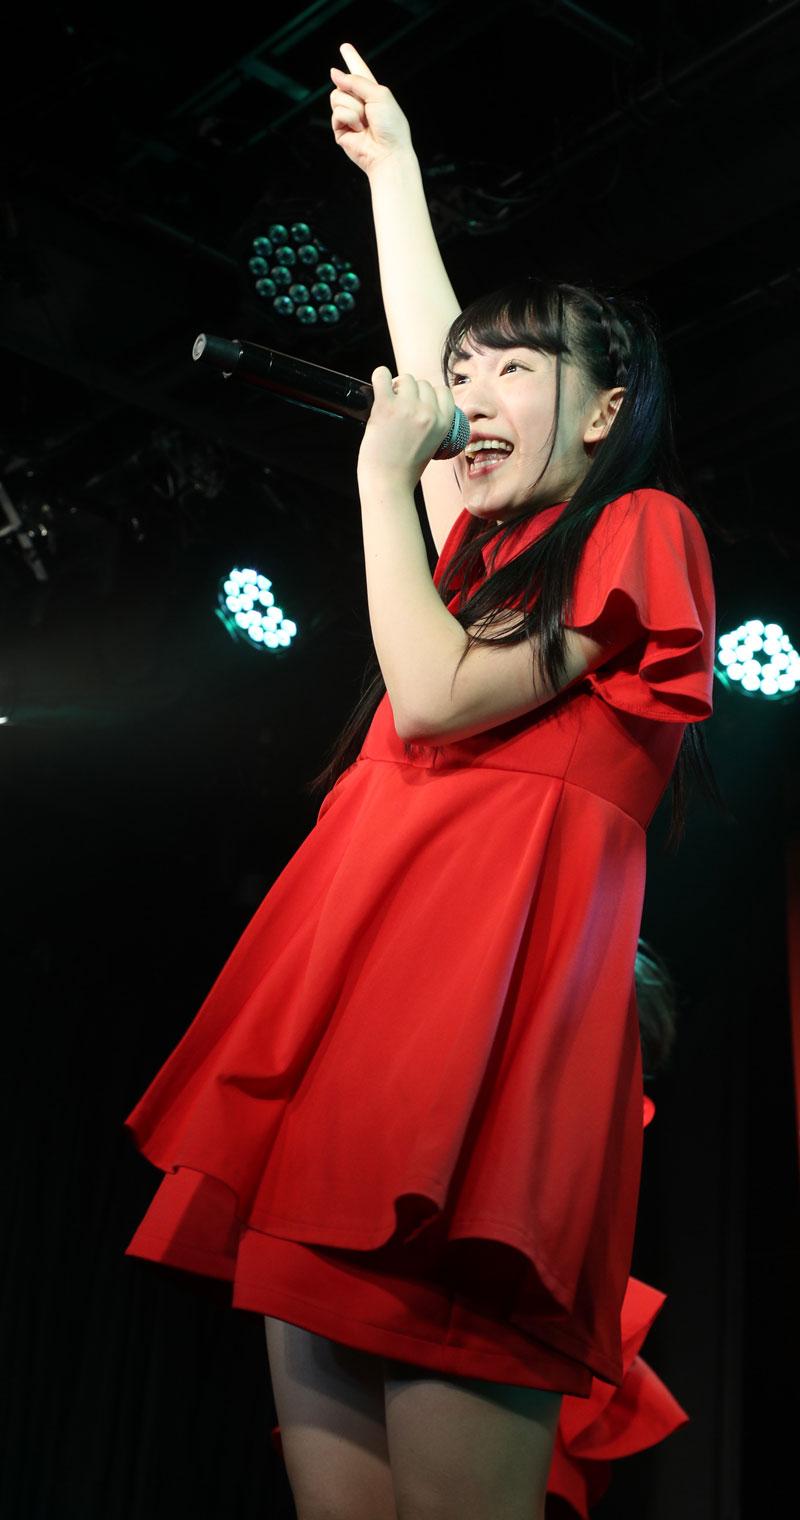 Images : 23番目の画像 - 7月30日にAKIBAカルチャーズ劇場で開催された「定期公演第七片」より - Stereo Sound ONLINE